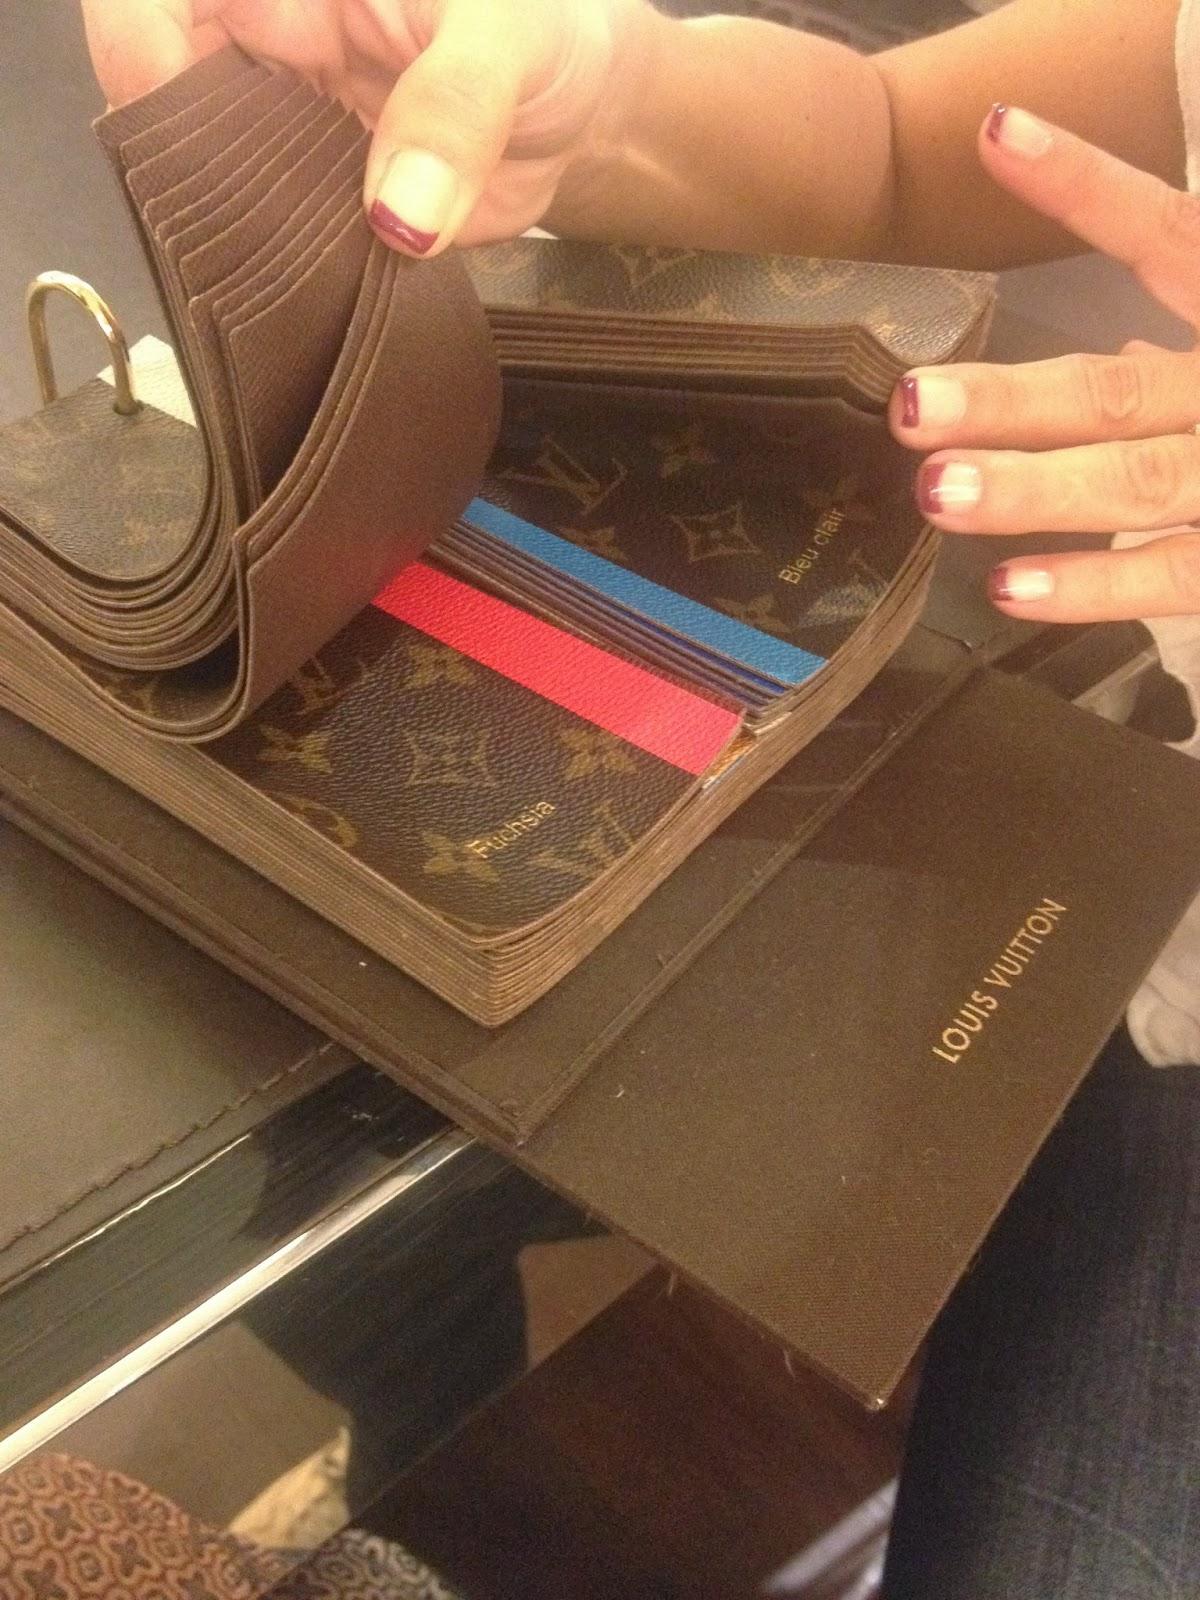 prada imitation - quanto costa una borsa hermes scarpe hogan alte